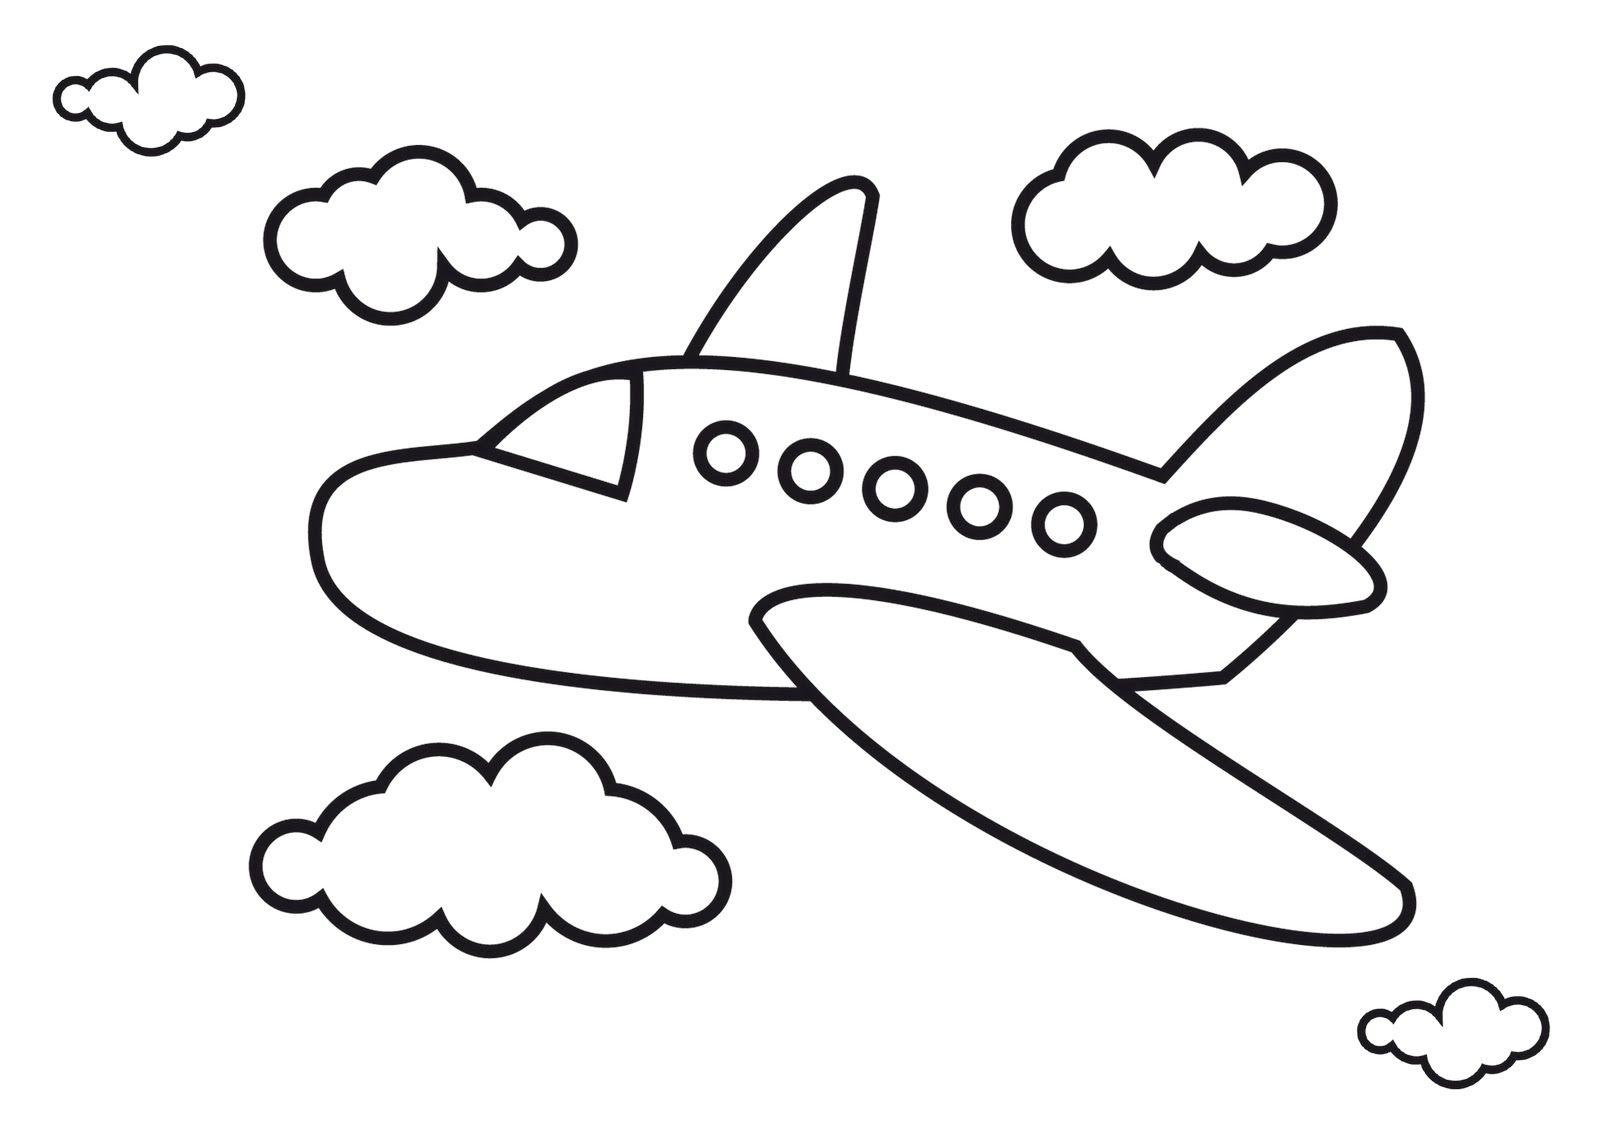 Biplane coloring page